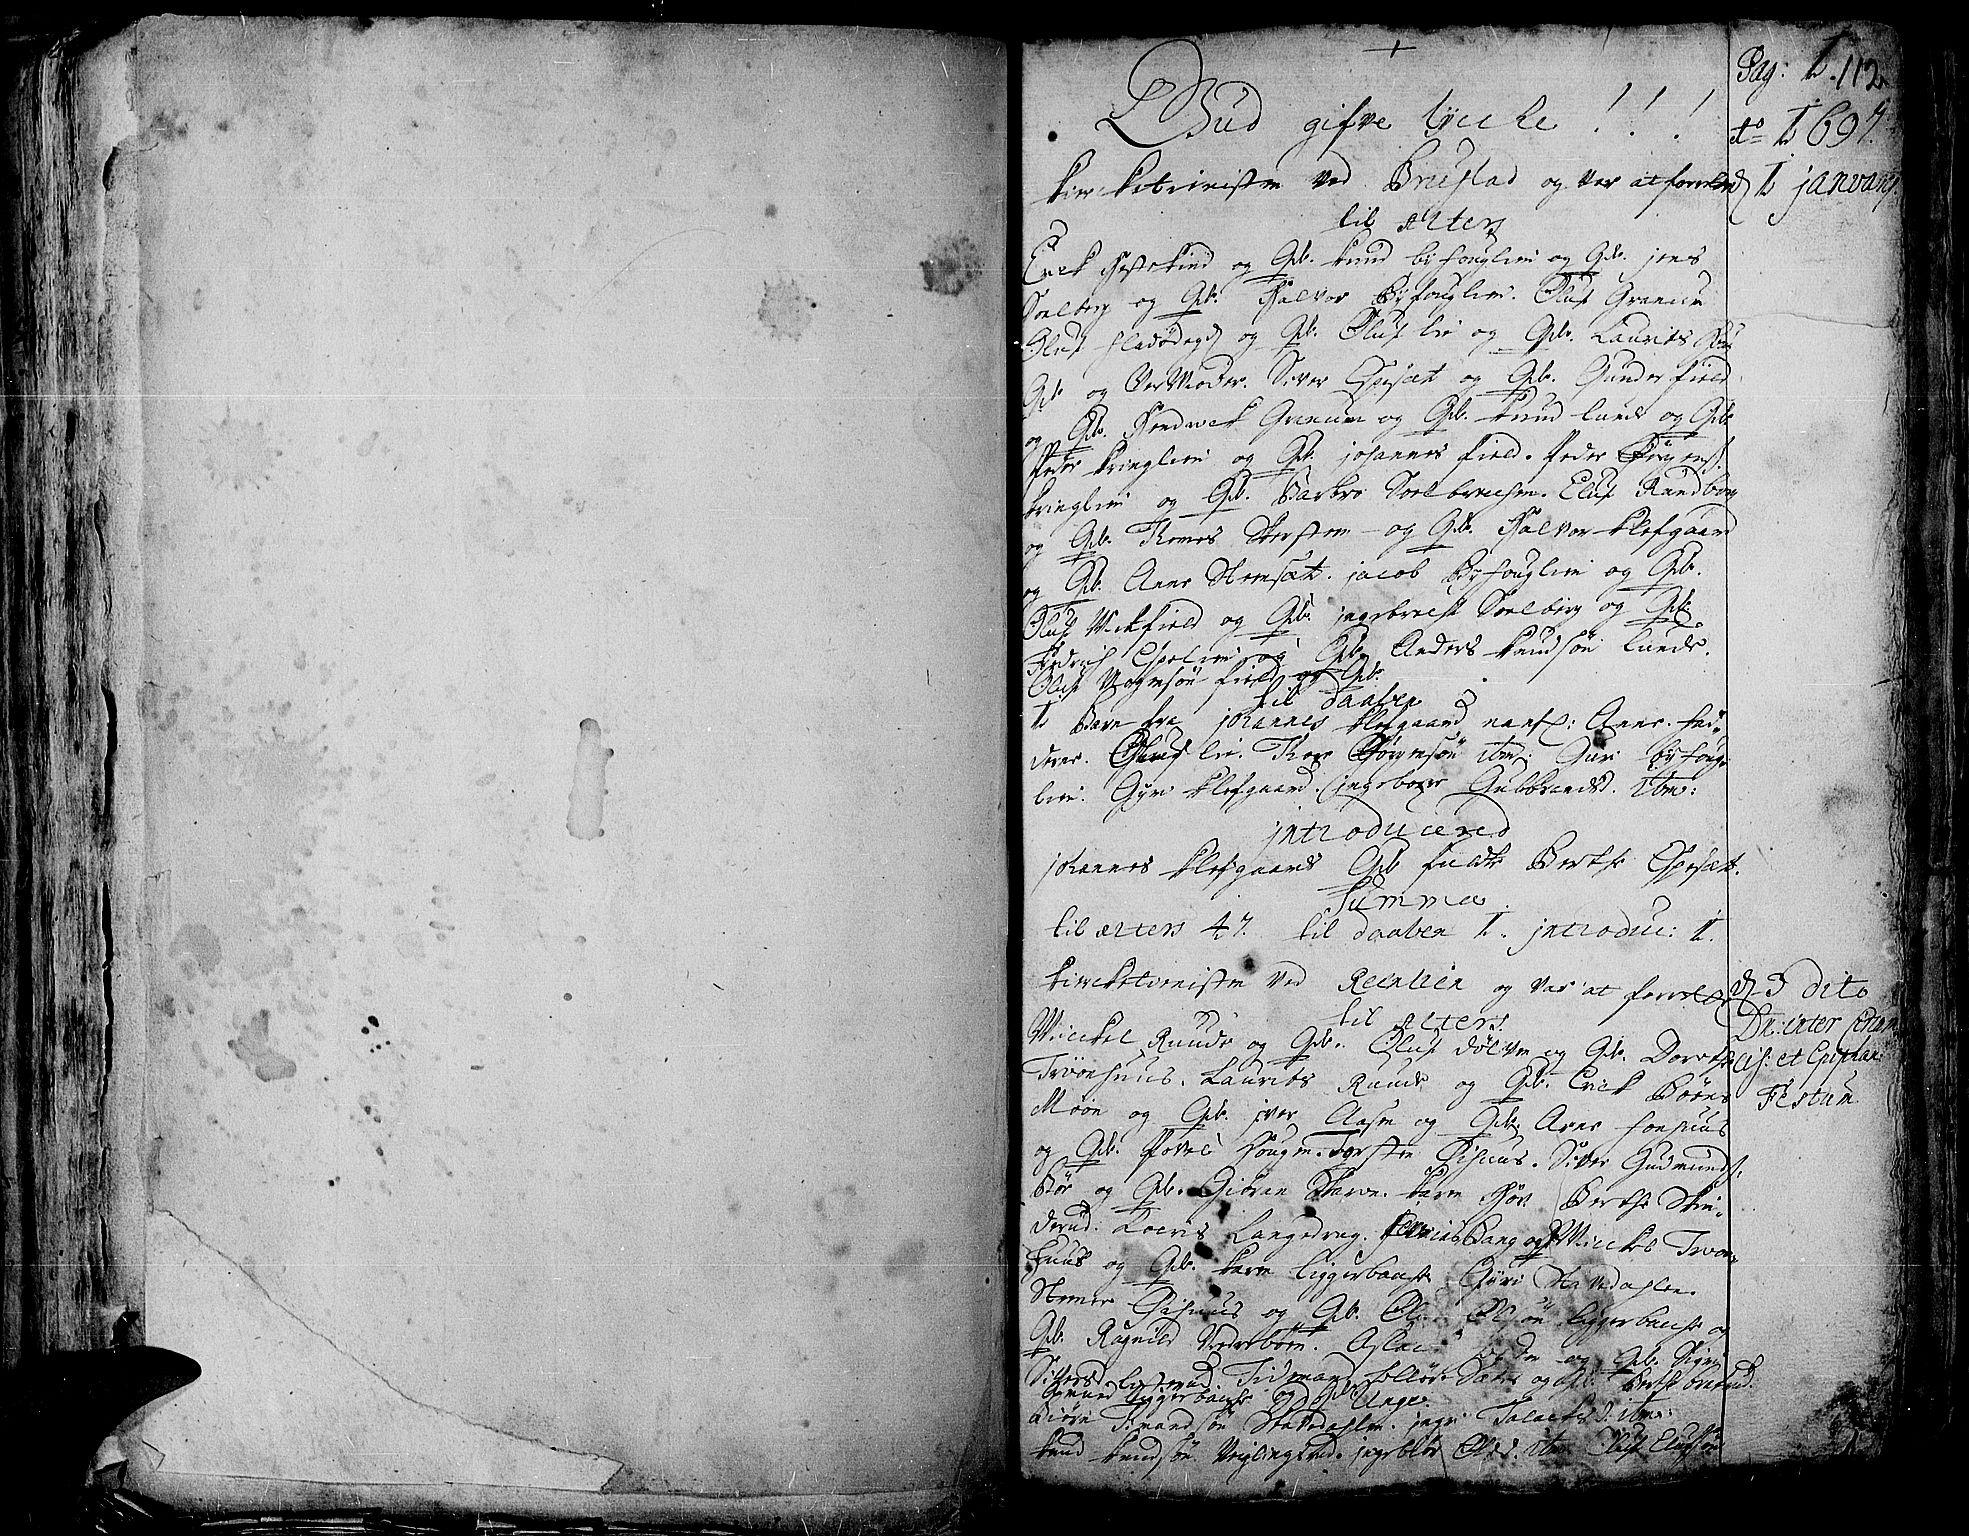 SAH, Aurdal prestekontor, Ministerialbok nr. 1-3, 1692-1730, s. 112